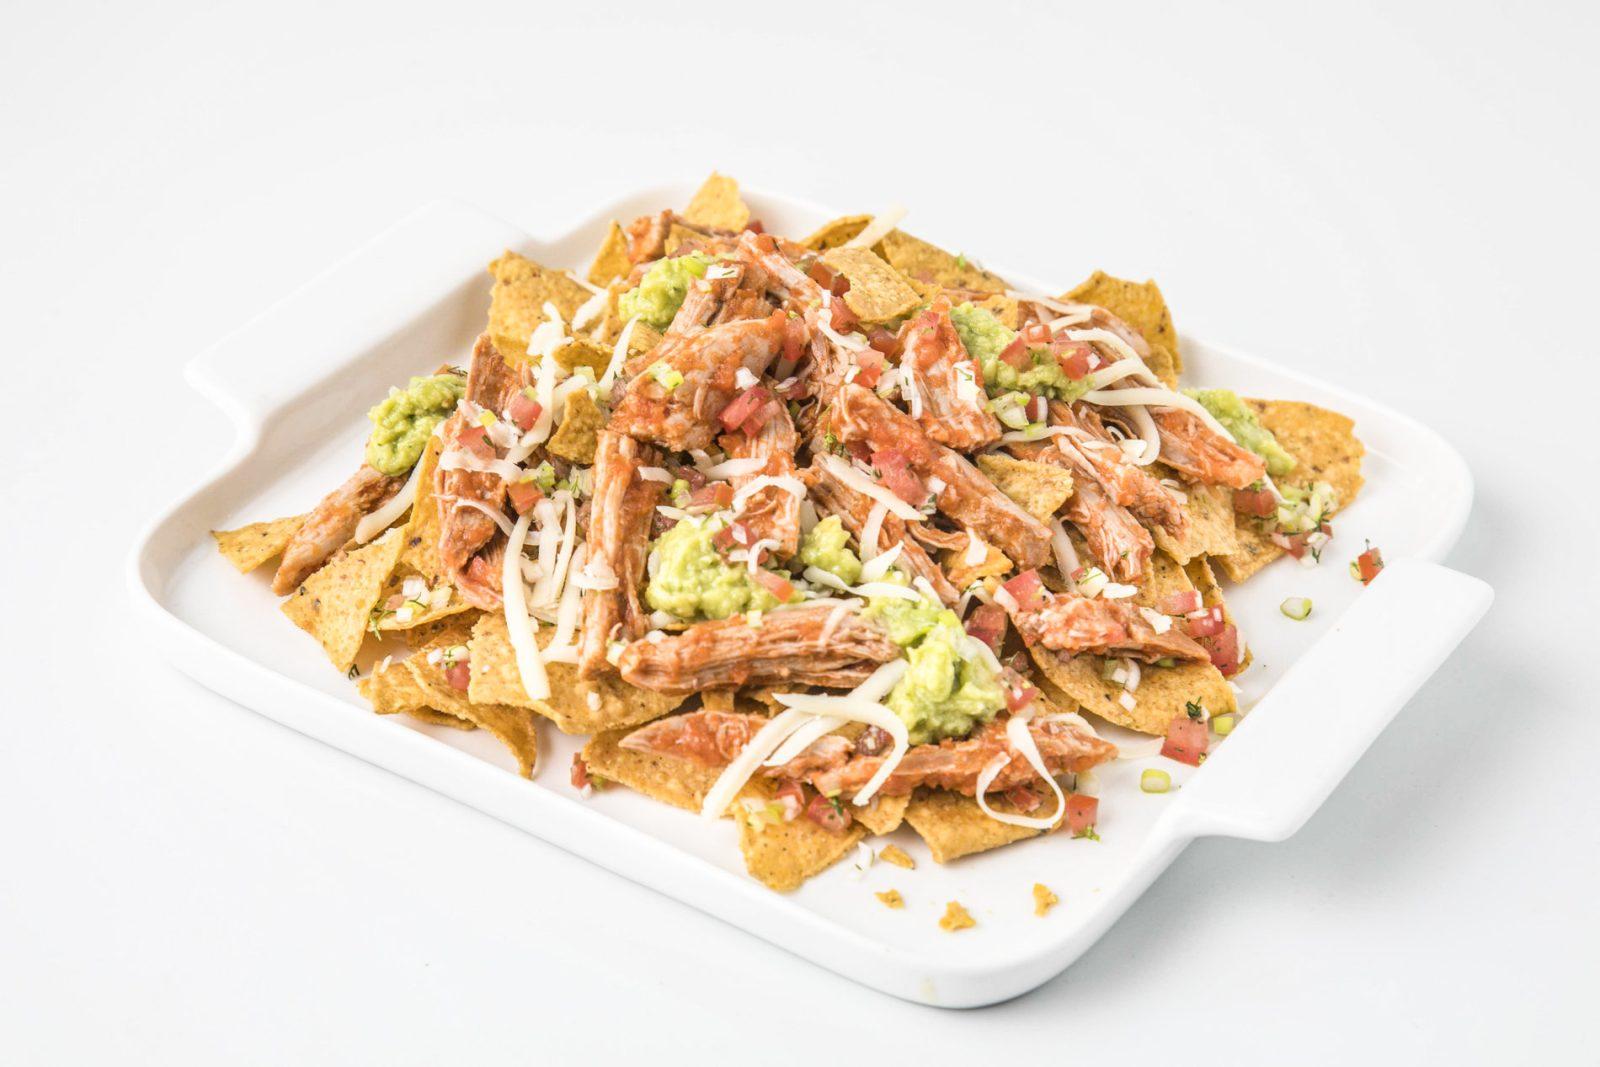 Tortillas Mexicanas Con Bondiola De Cerdo Horneada